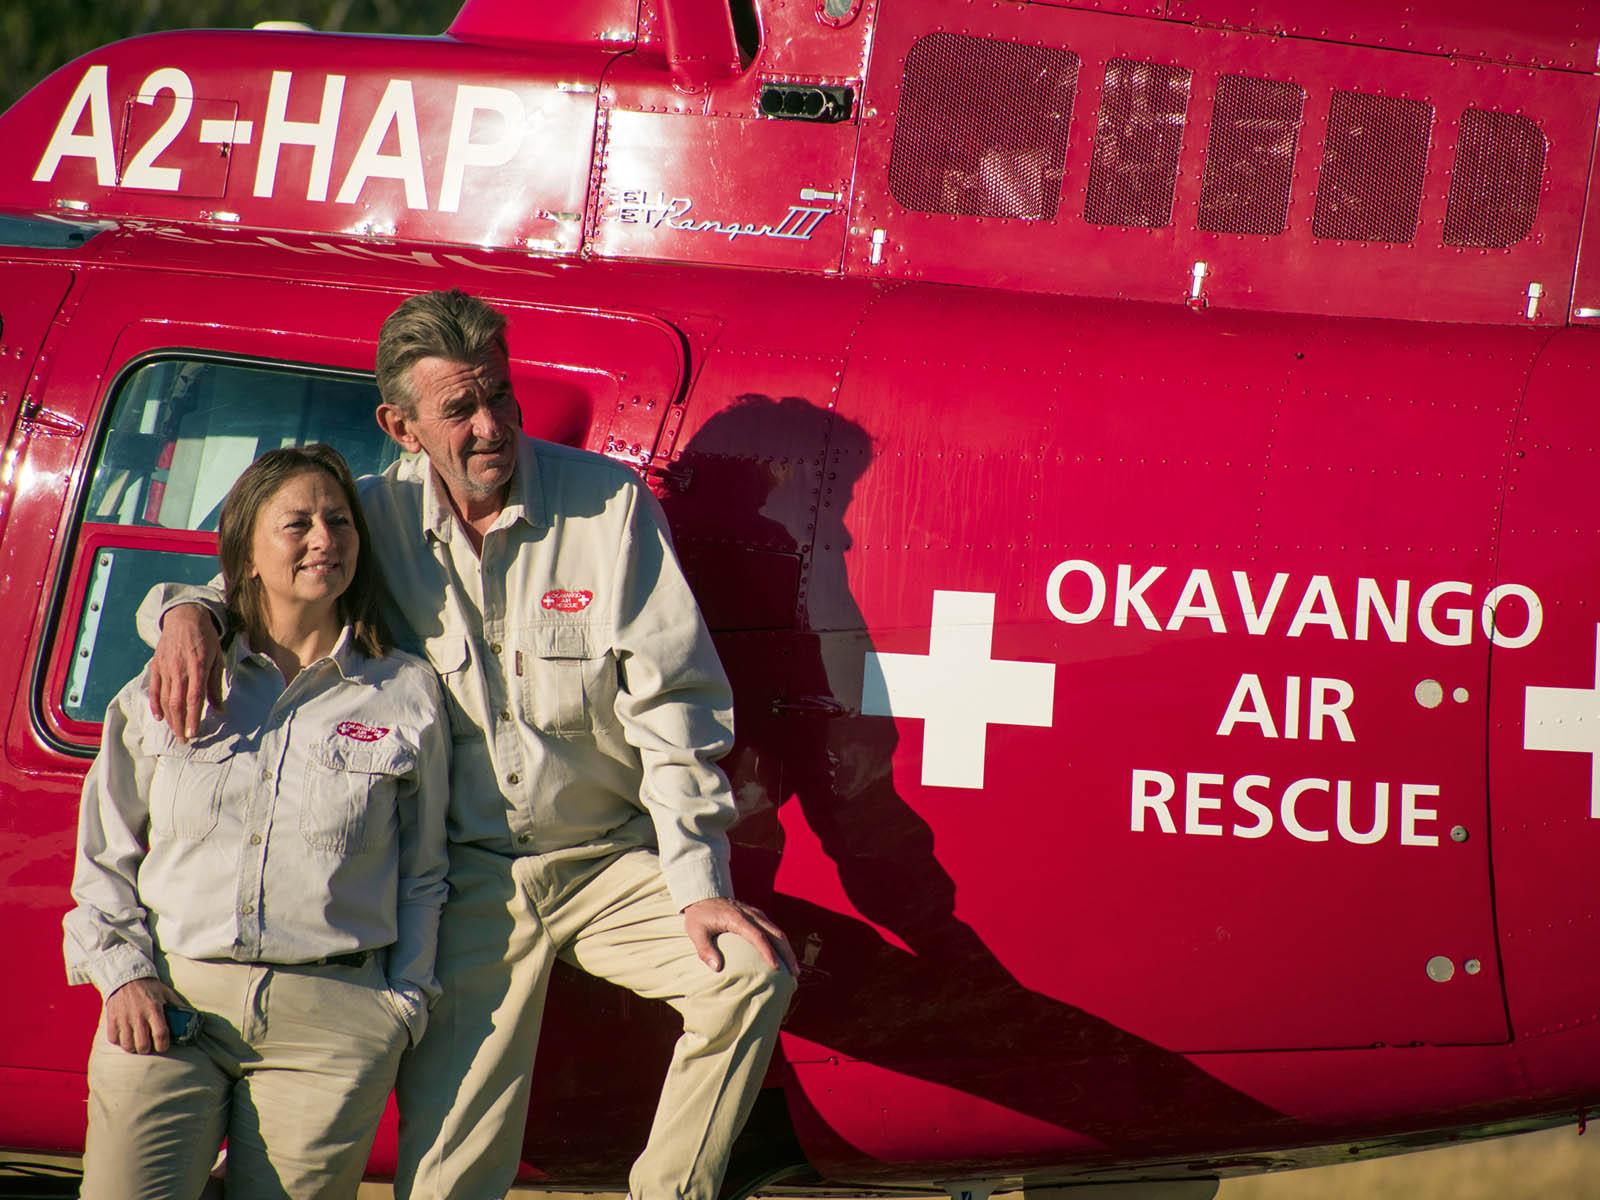 01-751-7761-4187-set-oris-big-crown-propilot-okavango-air-rescue-limited-edition-2.jpg